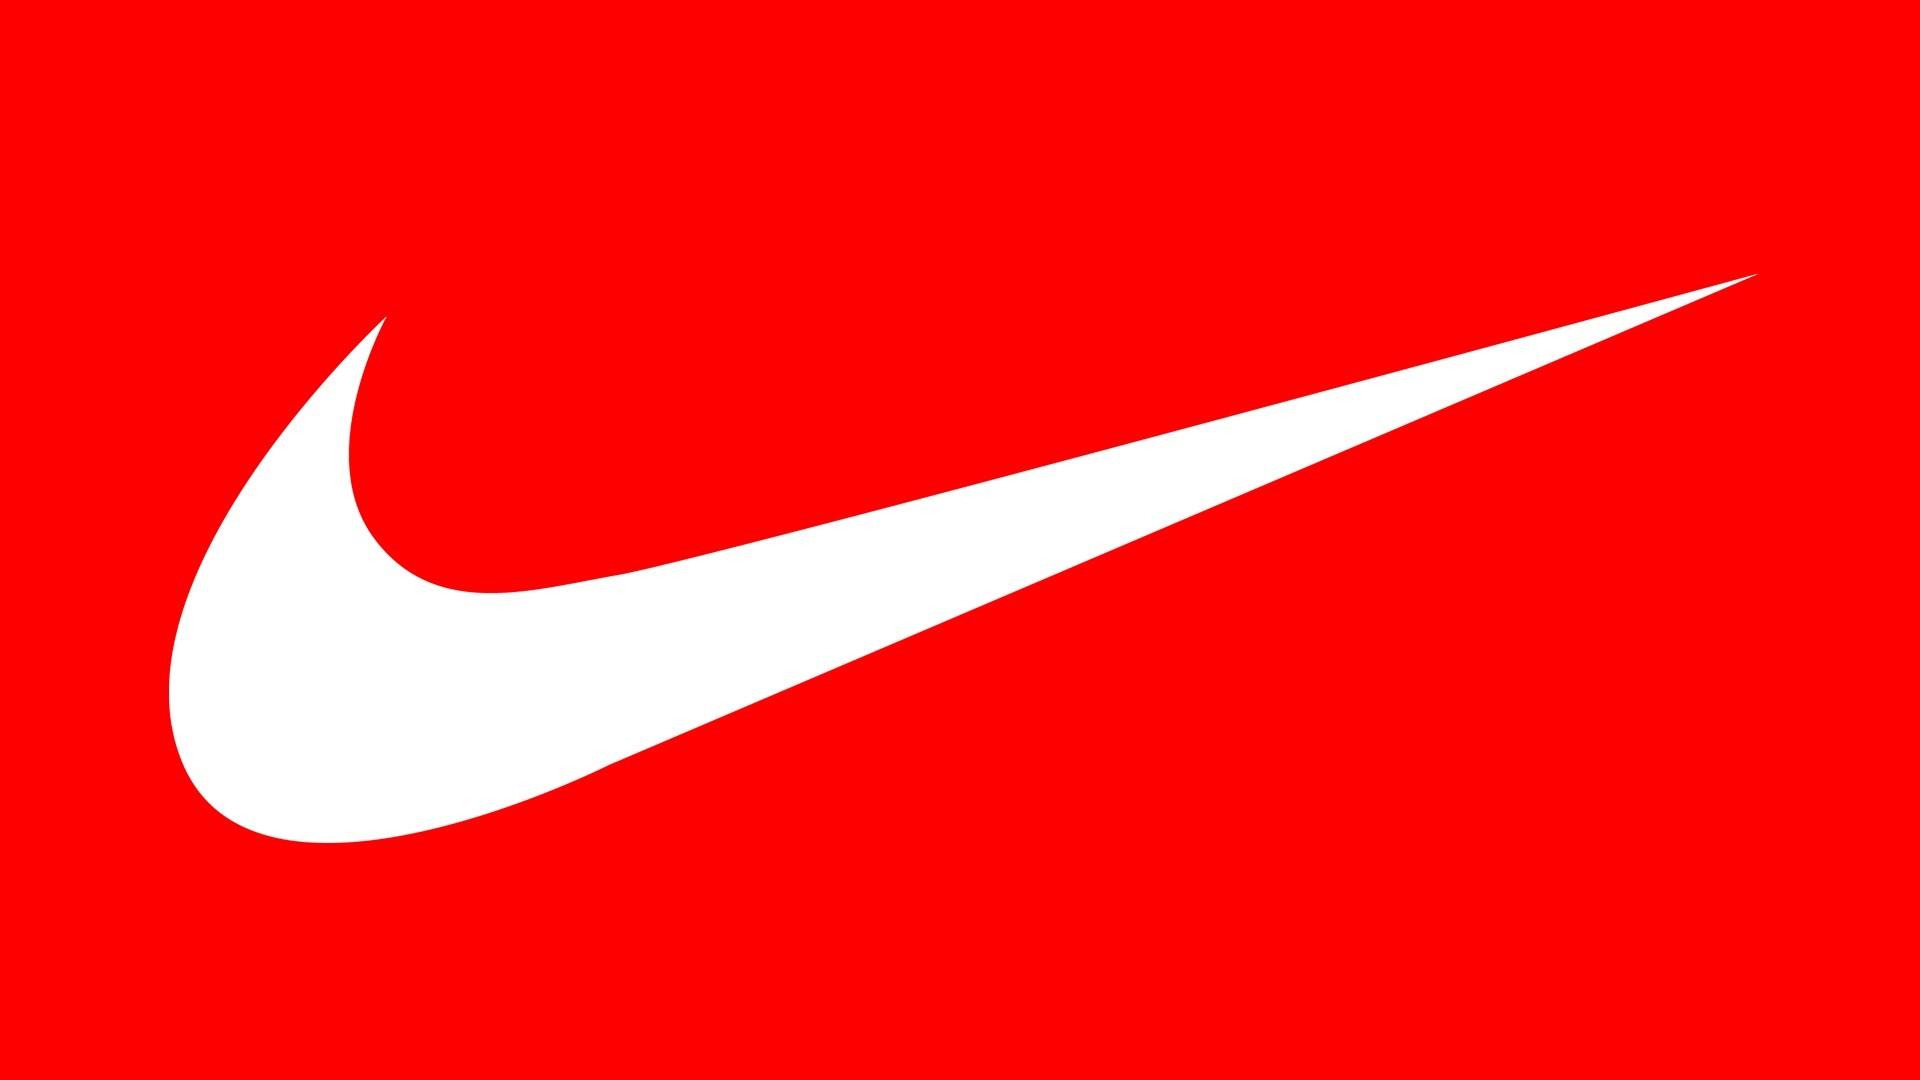 Nike Symbol Wallpaper (64+ Images